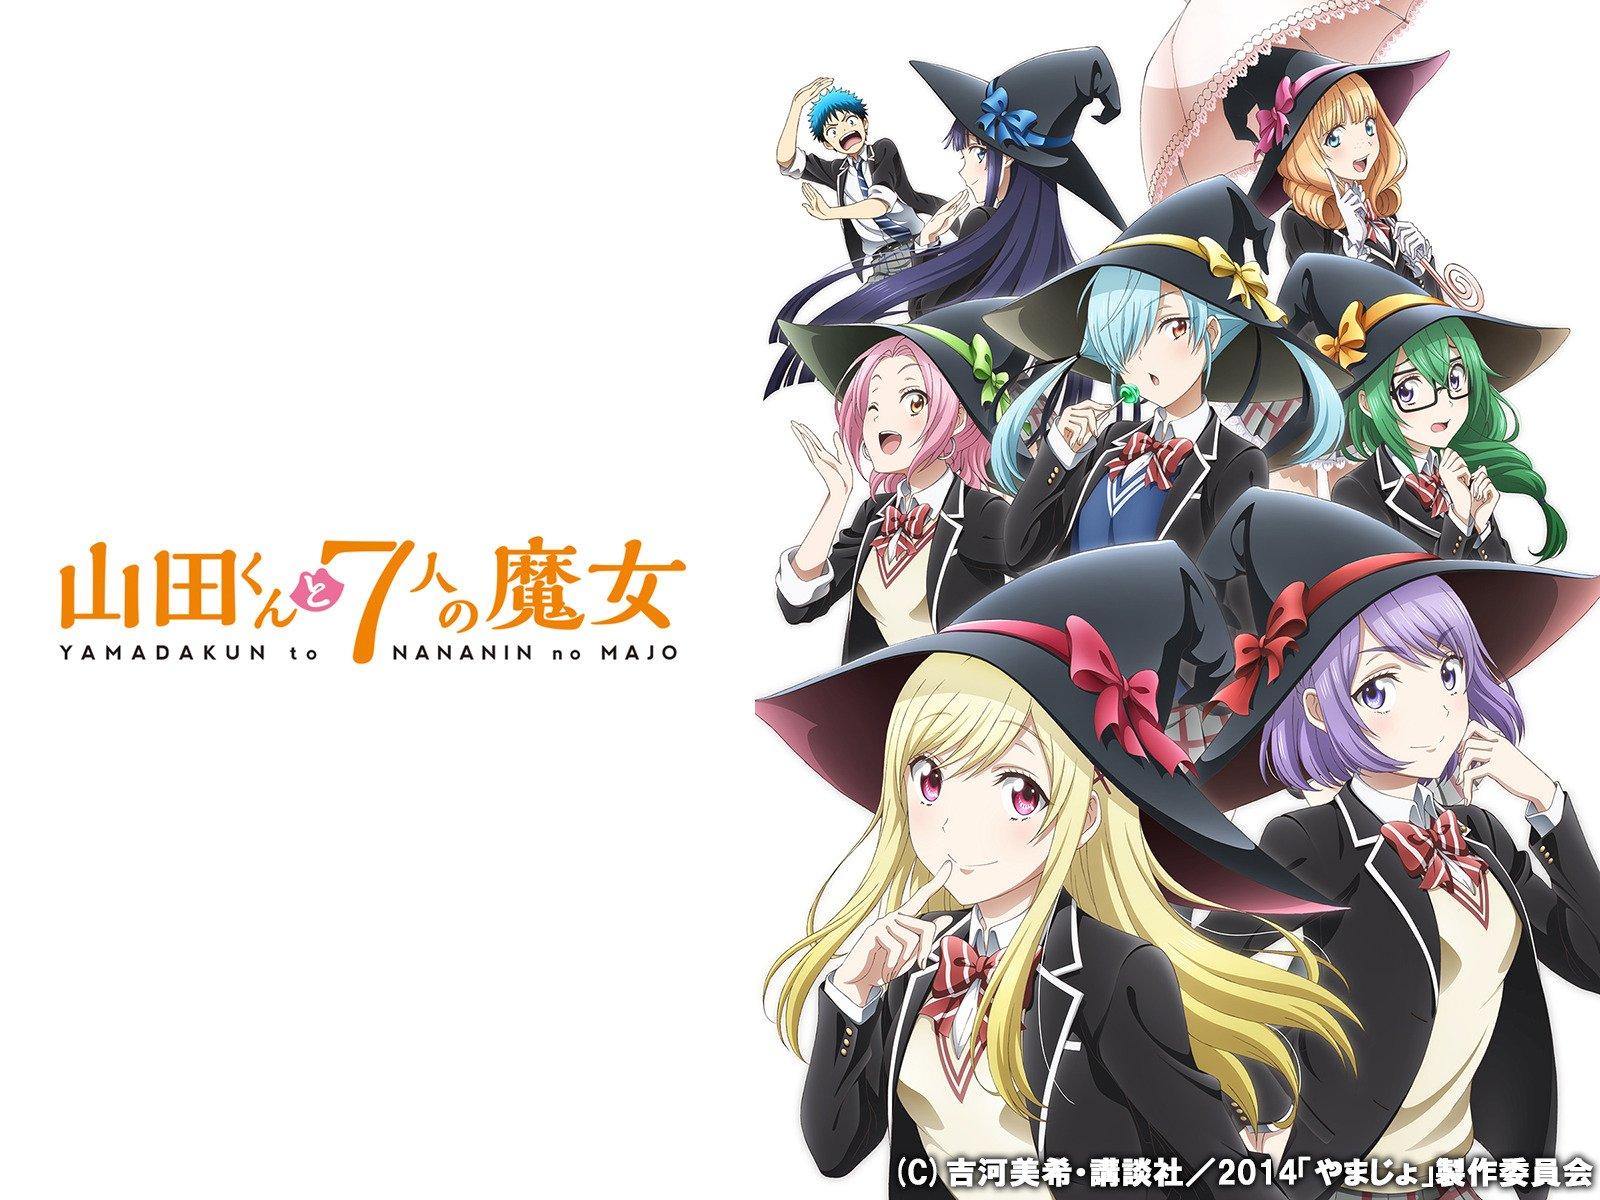 Amazon Co Jp 山田くんと7人の魔女を観る Prime Video